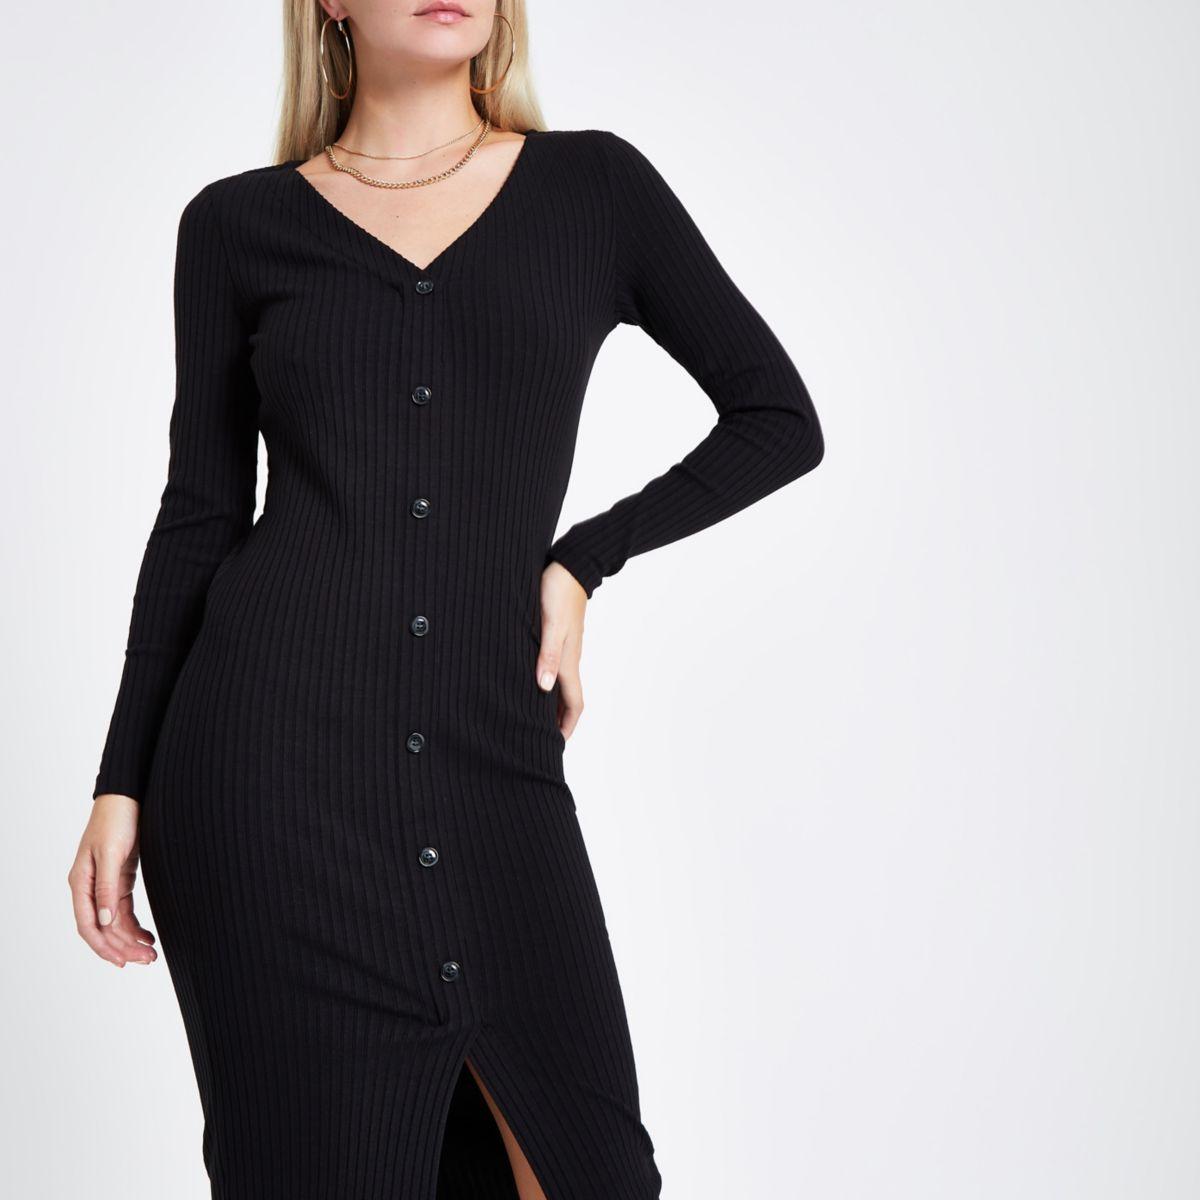 Petite black button front bodycon dress